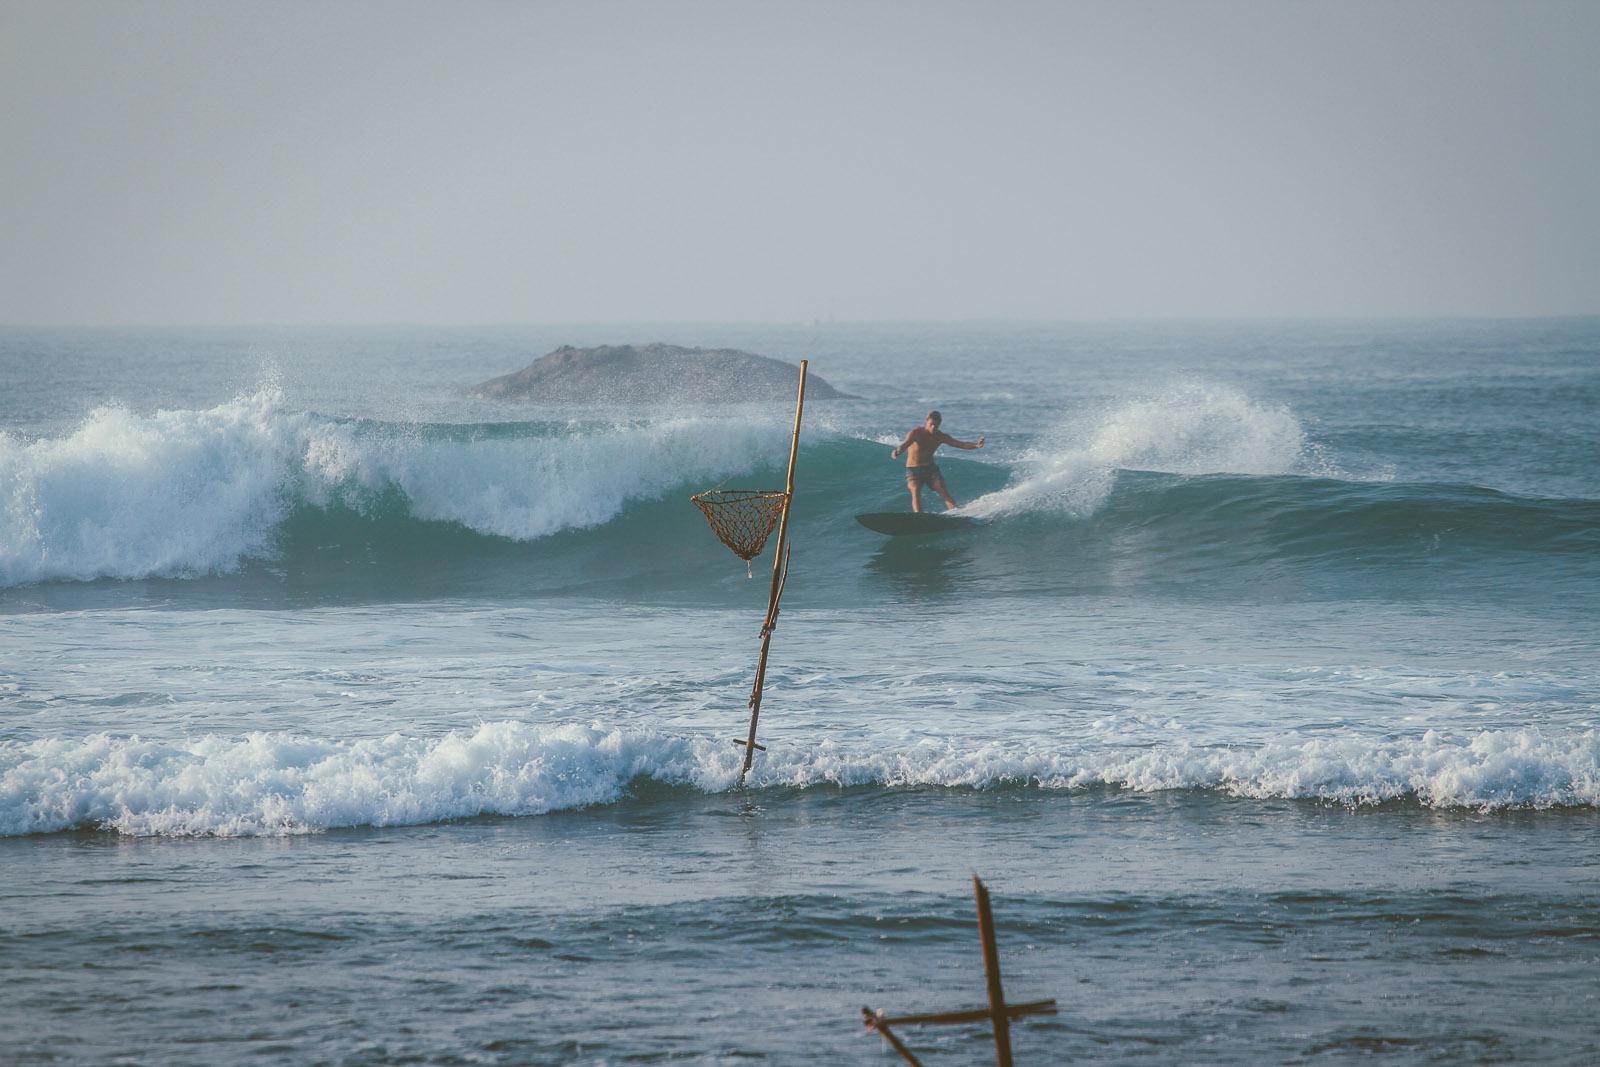 Sri Lanka-Ahangama-Kabalana-The rock-Surf-Barrel-Big swell-Midigama-Surfing-travel-blog-IMG_8700